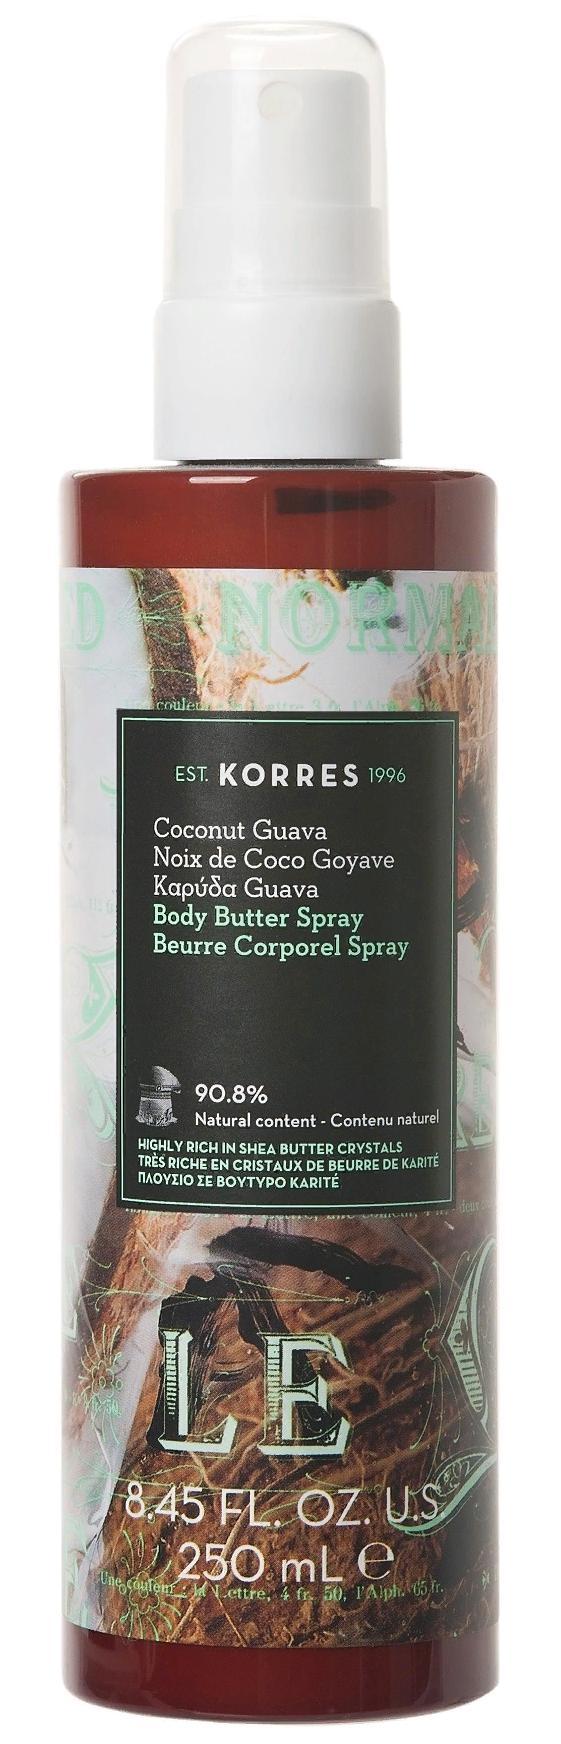 KORRES Молочко-спрей для тела, кокос и гуава 250 мл